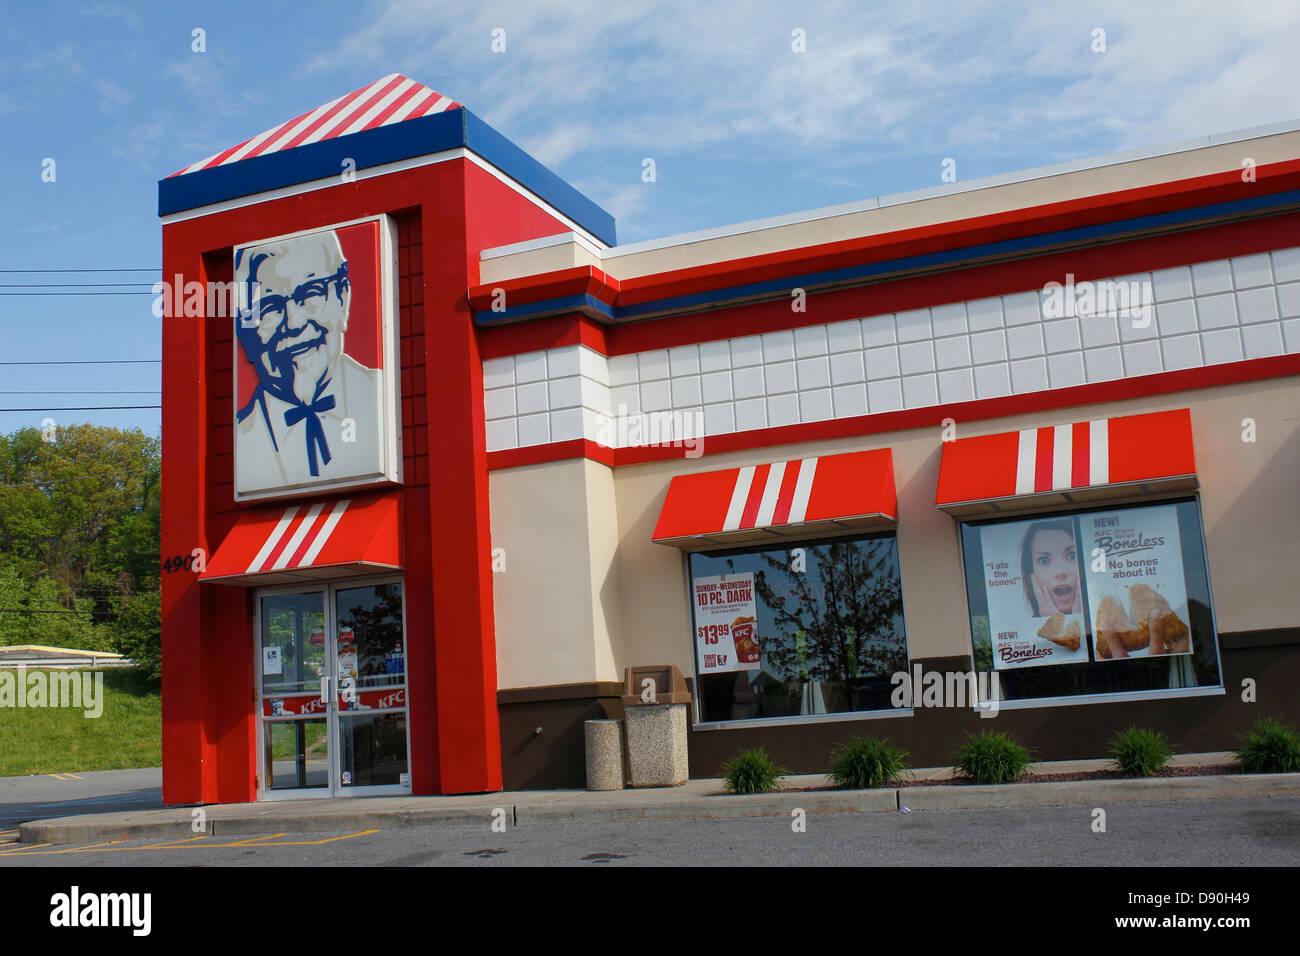 Kfc Kentucky Fried Chicken Store Front Stock Photo